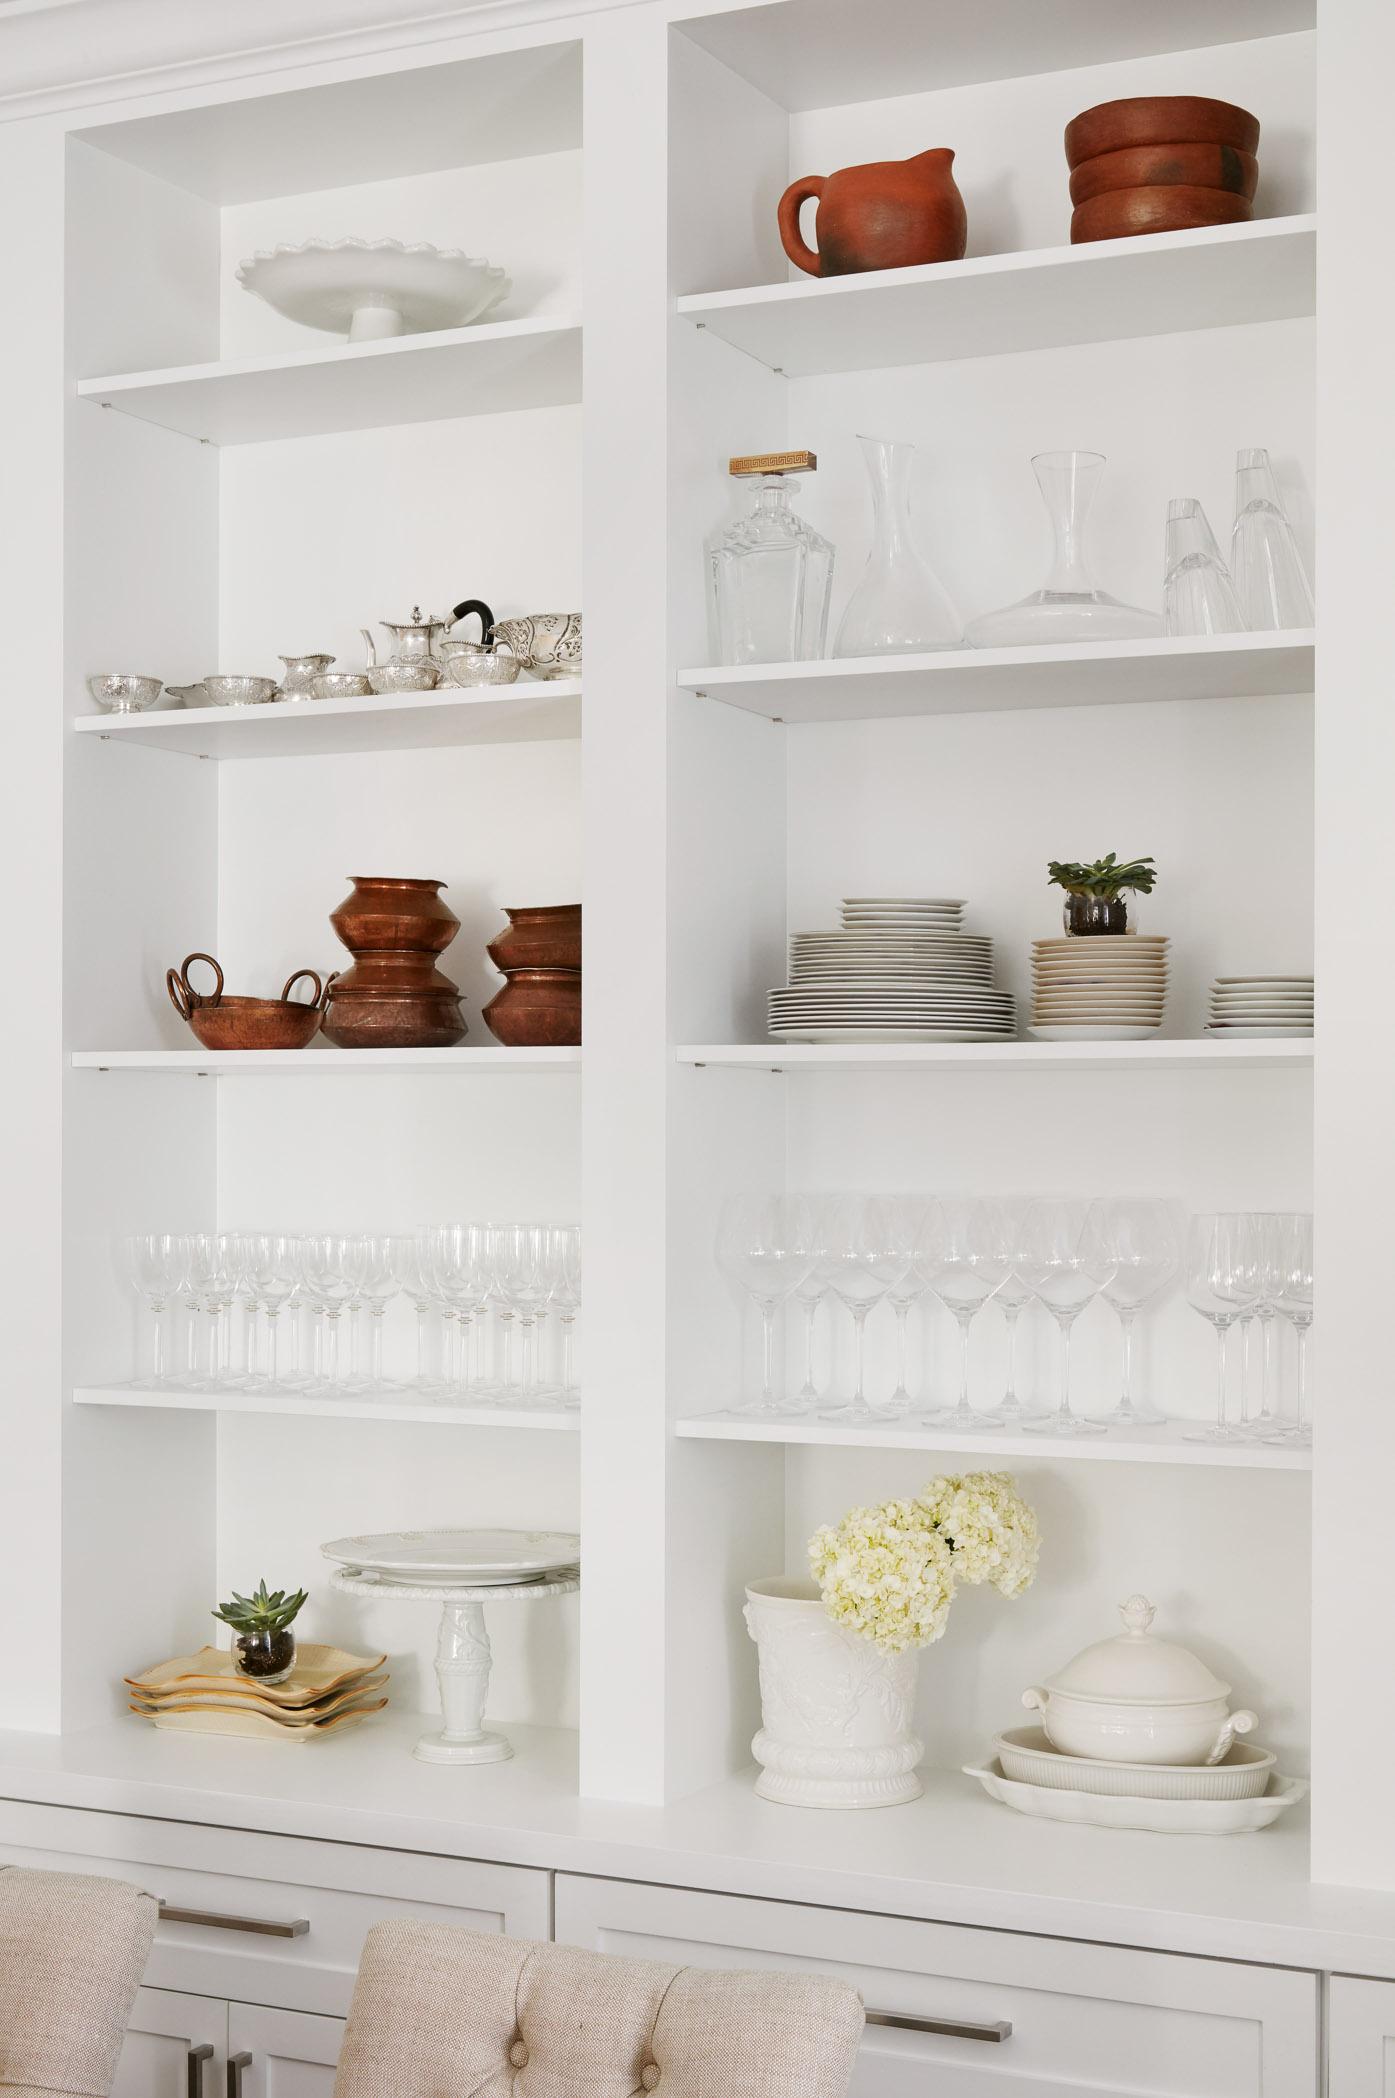 Westshore Dr Project – Kitchen Shelf Styling